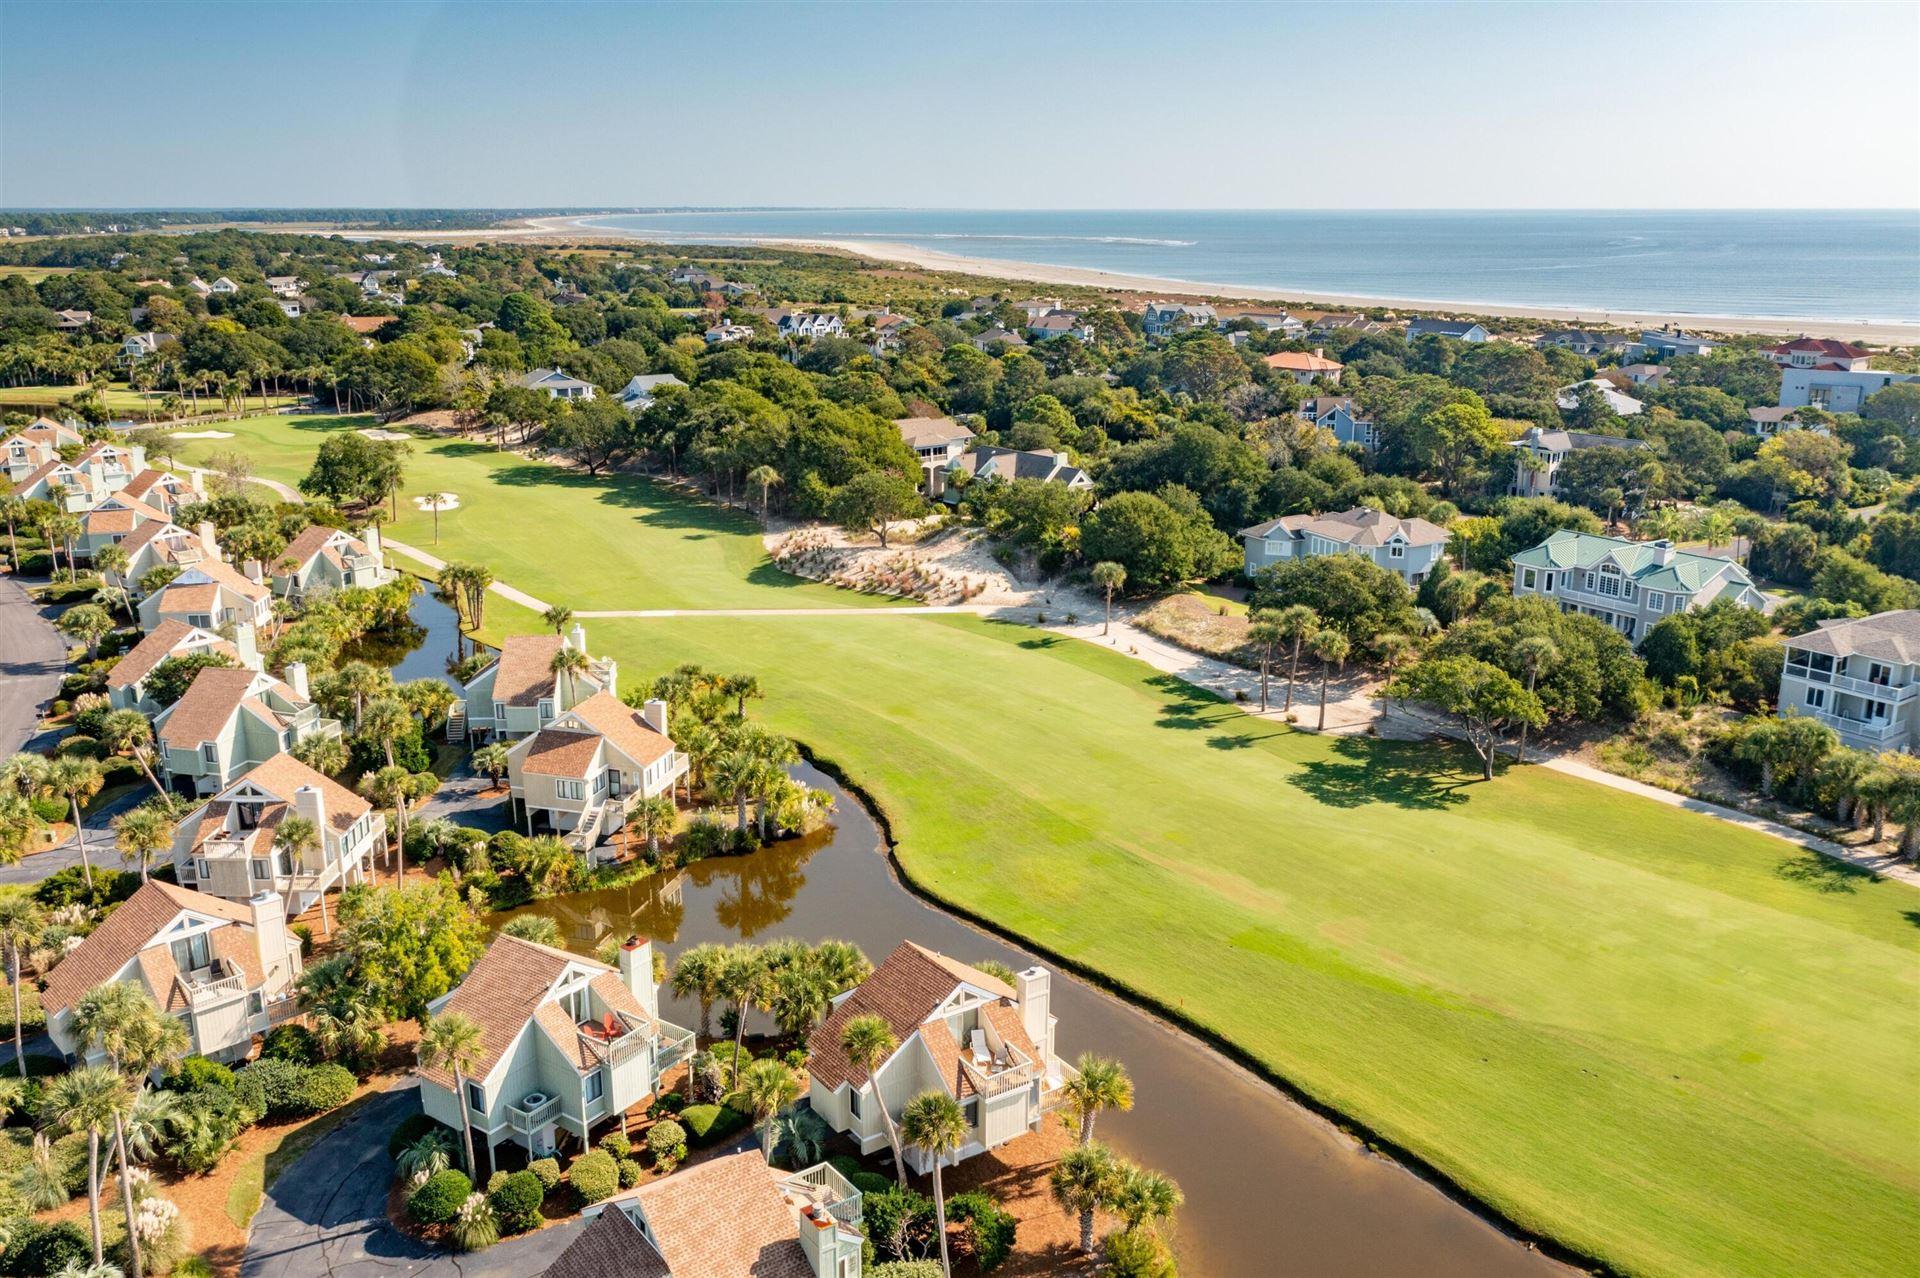 Photo of 937 Sealoft Villa Drive, Seabrook Island, SC 29455 (MLS # 21028632)